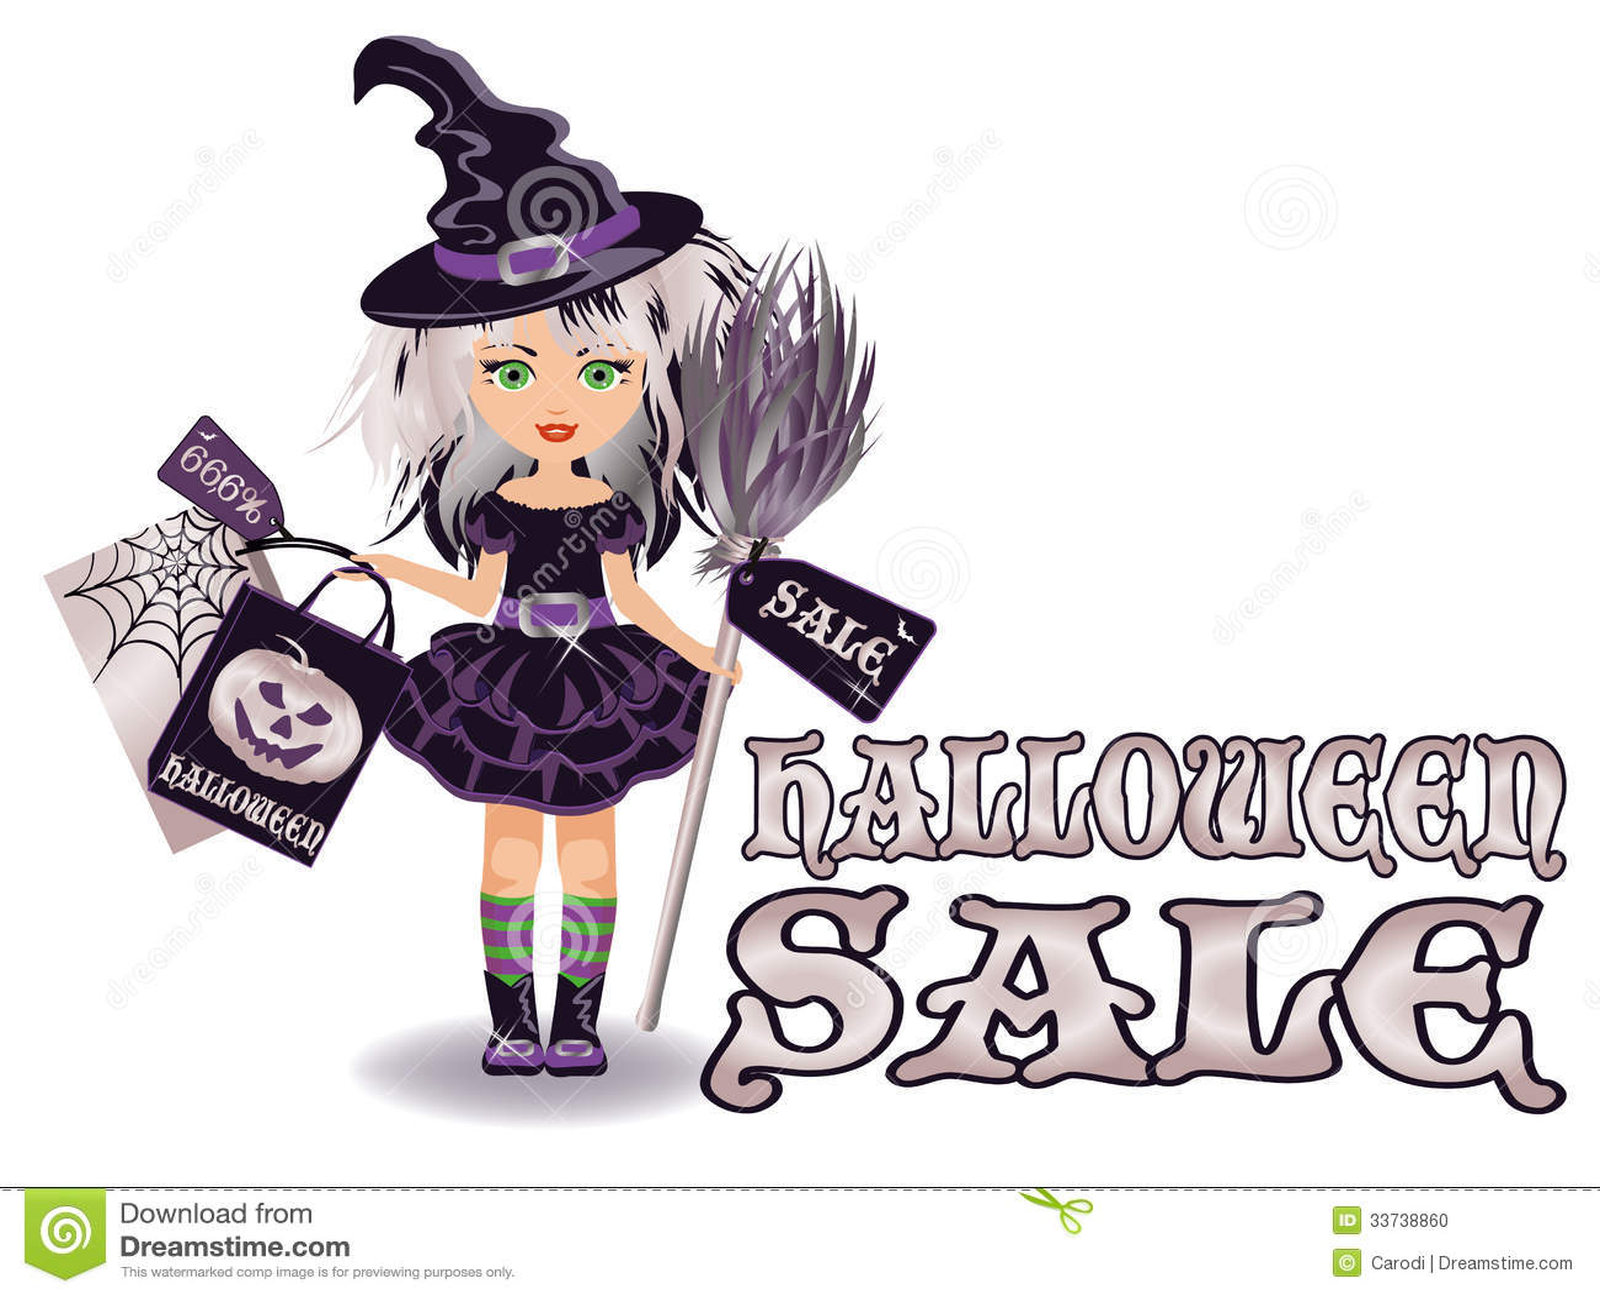 halloween sale - Halloween Sale